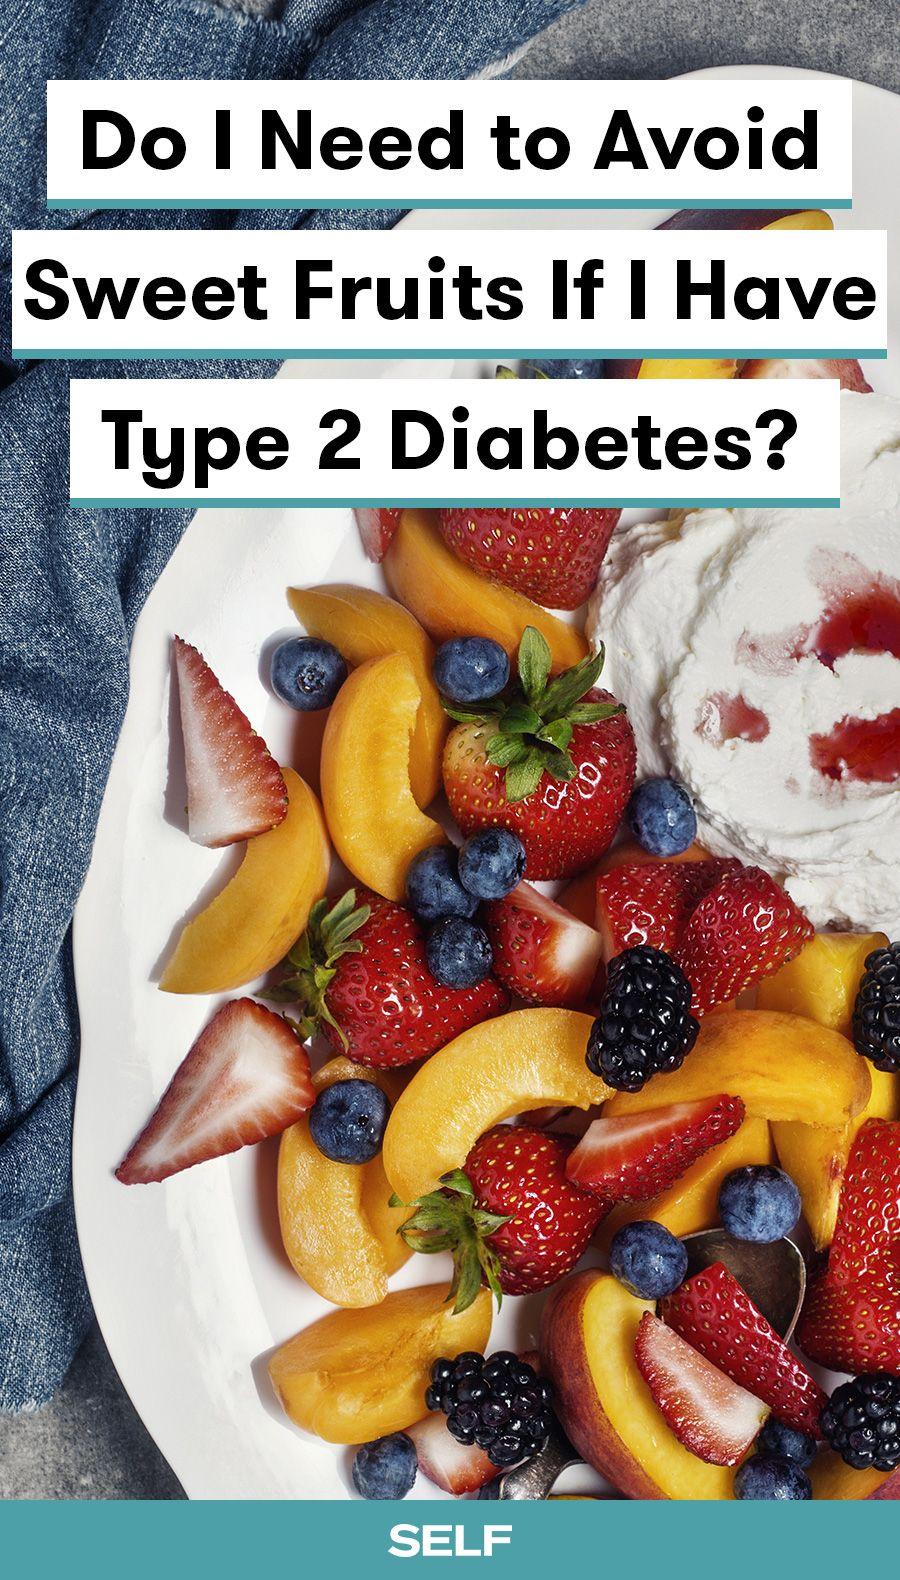 Can You Get Diabetes From Fruit Sugar Diabetes Diet Should I Avoid Sweet Fruits In 2020 Diabetes Foods To Avoid Foods To Avoid Food